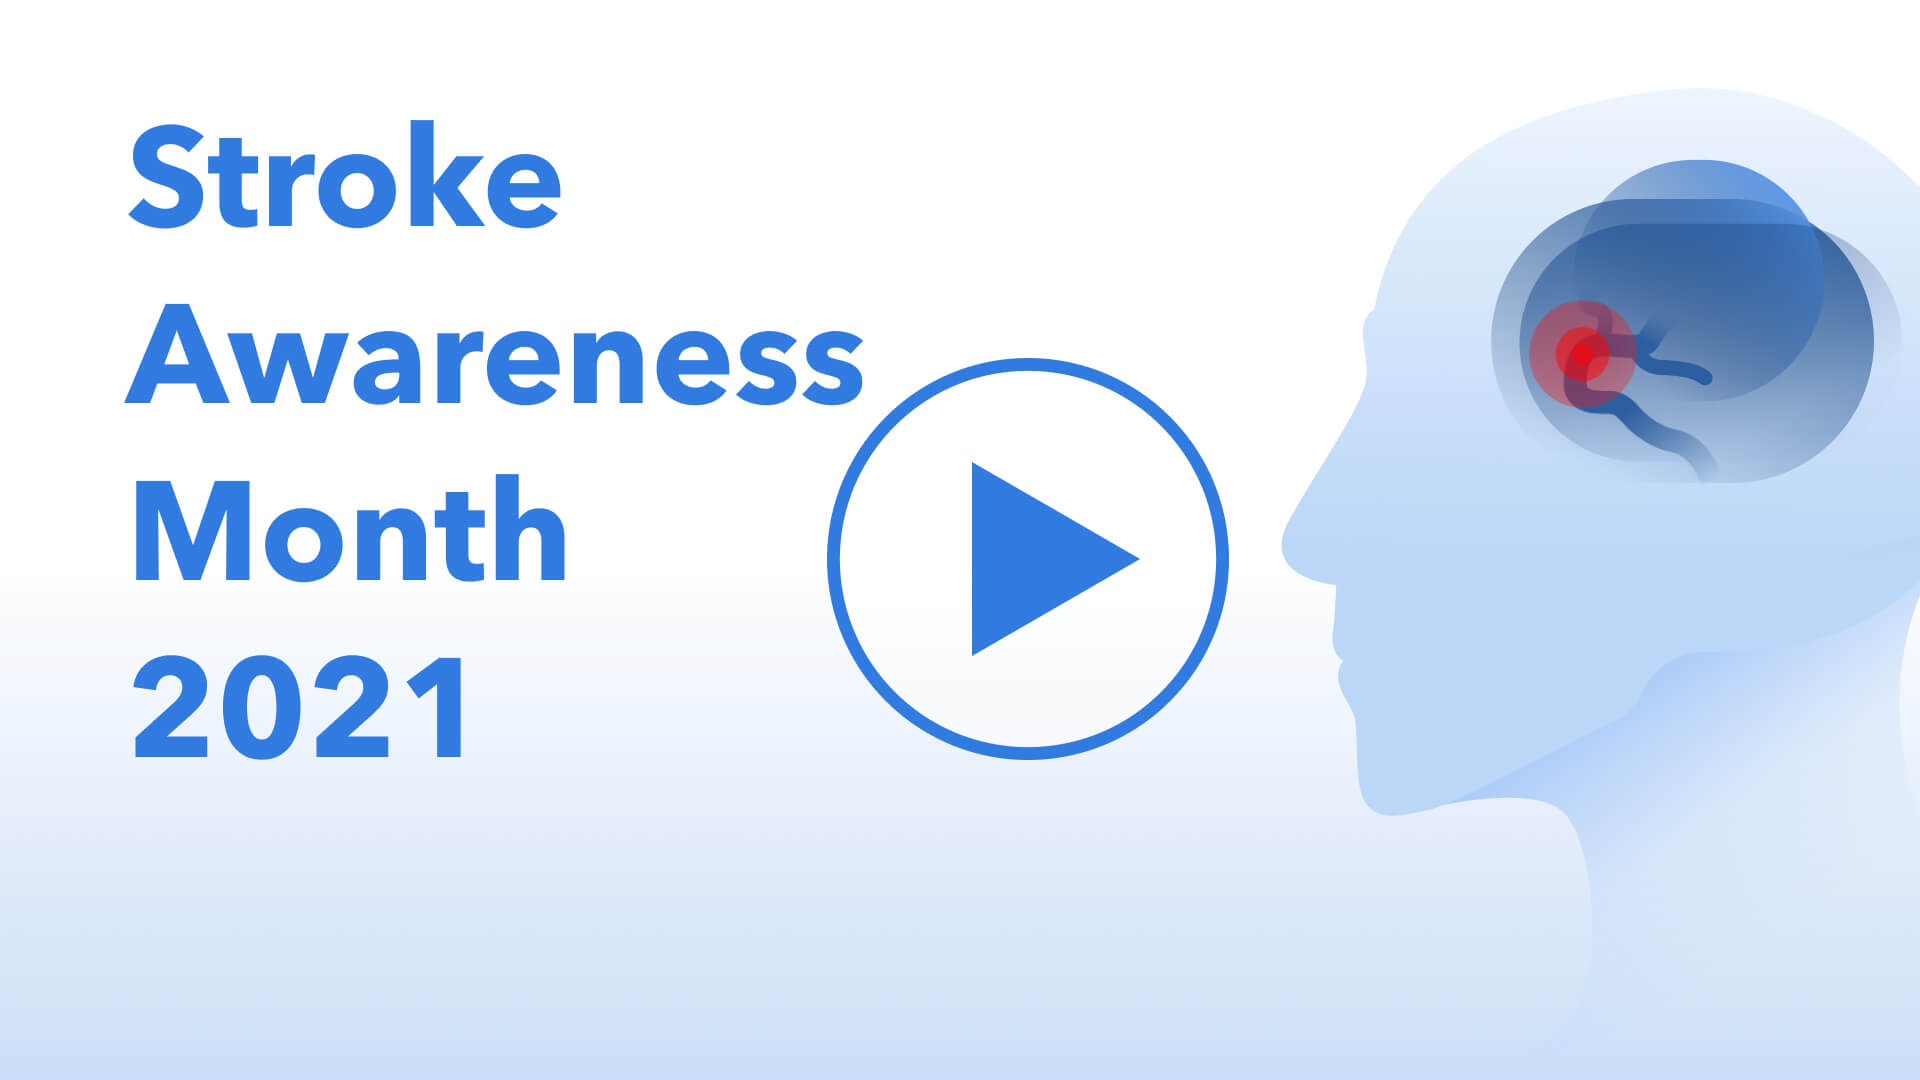 Stroke Awareness Month 2021